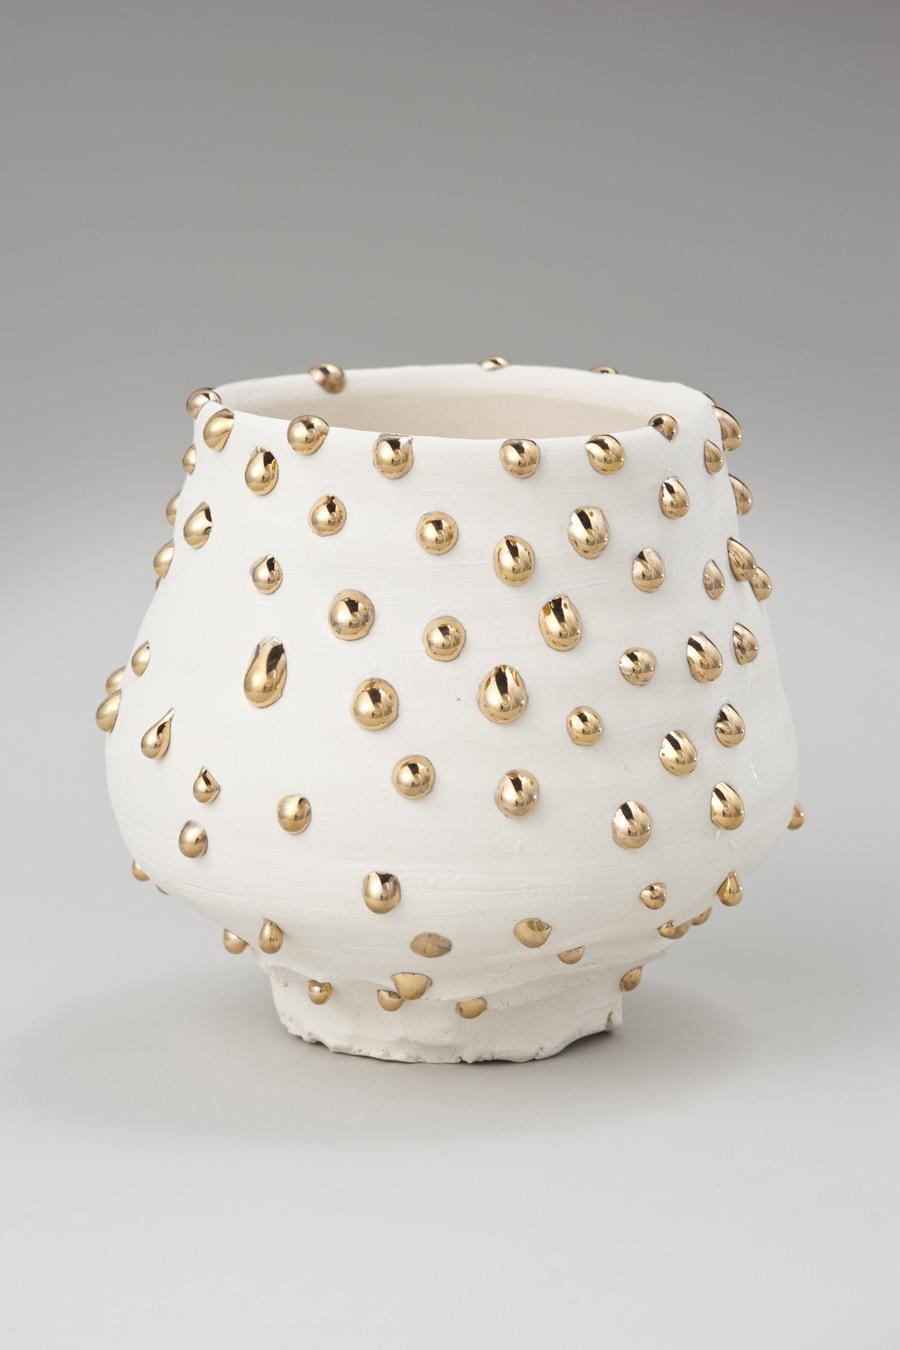 Extraordinary Contemporary Sculptures by Takuro Kuwata - White-porcelain Gold-drips bowl takuro kuwata Extraordinary Contemporary Sculptures by Takuro Kuwata Extraordinary Contemporary Sculptures by Takuro Kuwata White porcelain Gold drips bowl